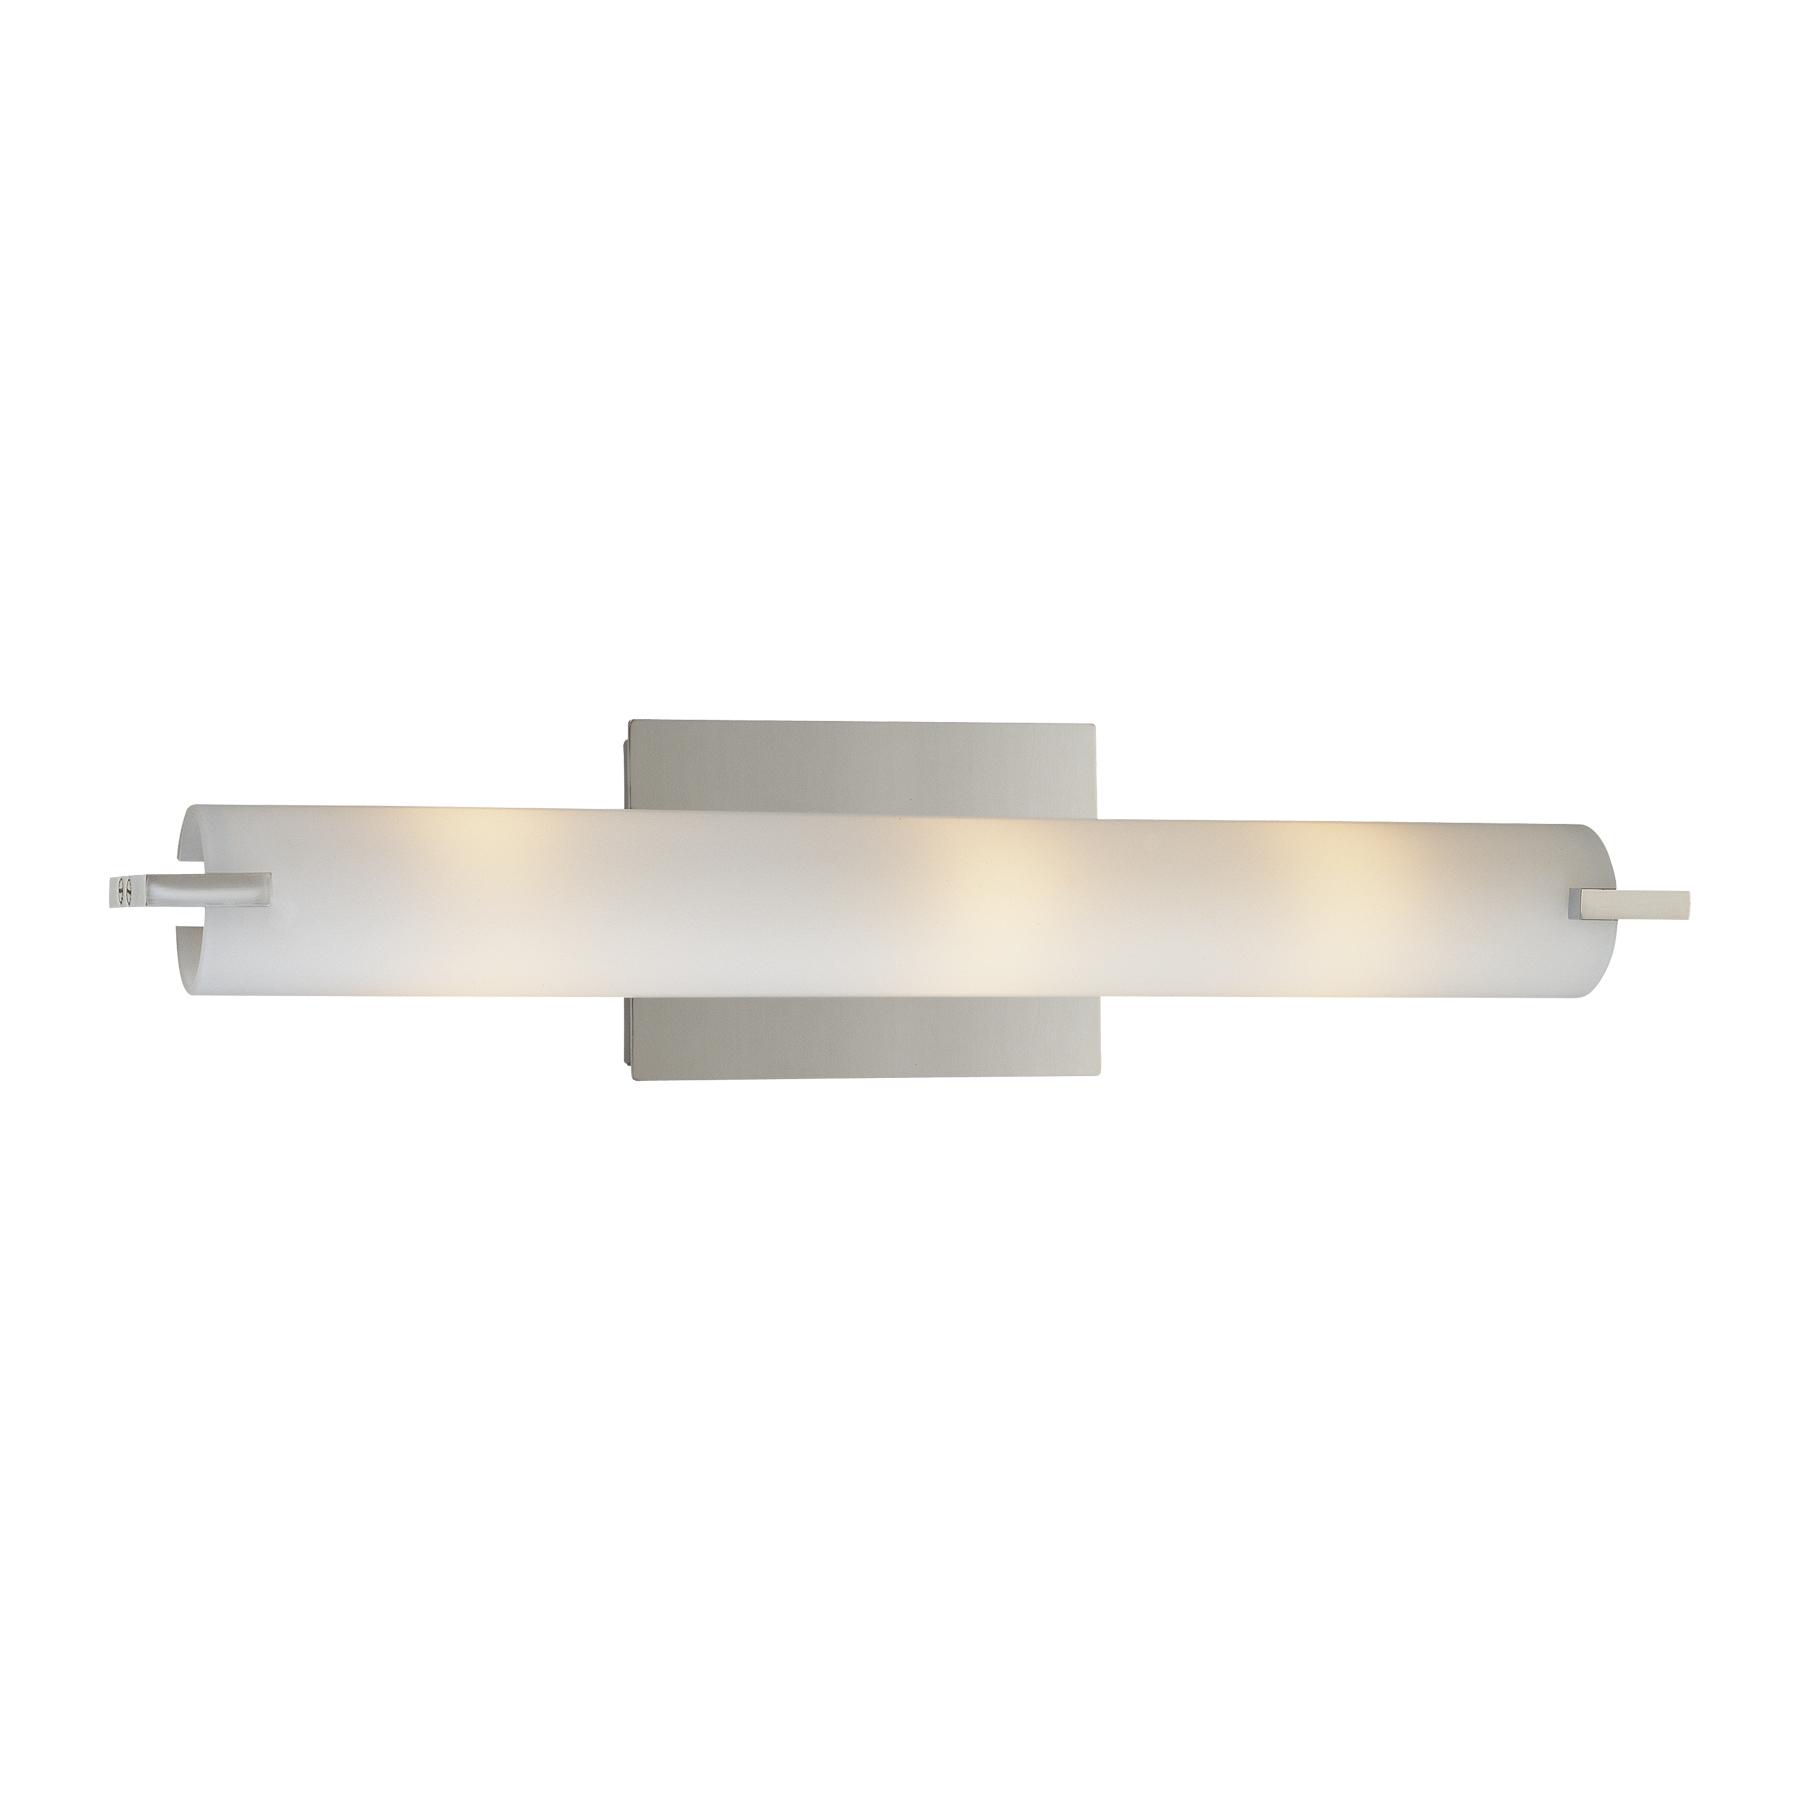 tube bath bar by george kovacs  p - tube light bath bar